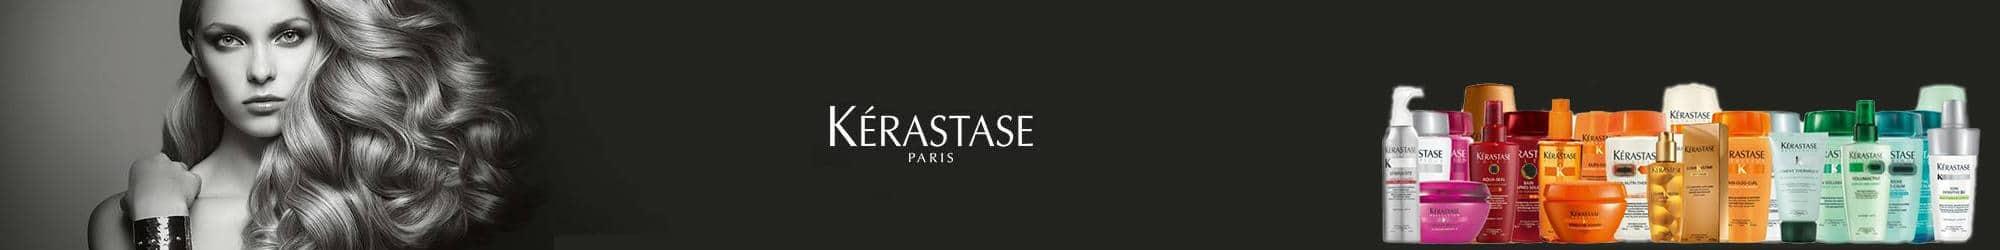 Gamme Kérastase Paris soins et shampoings